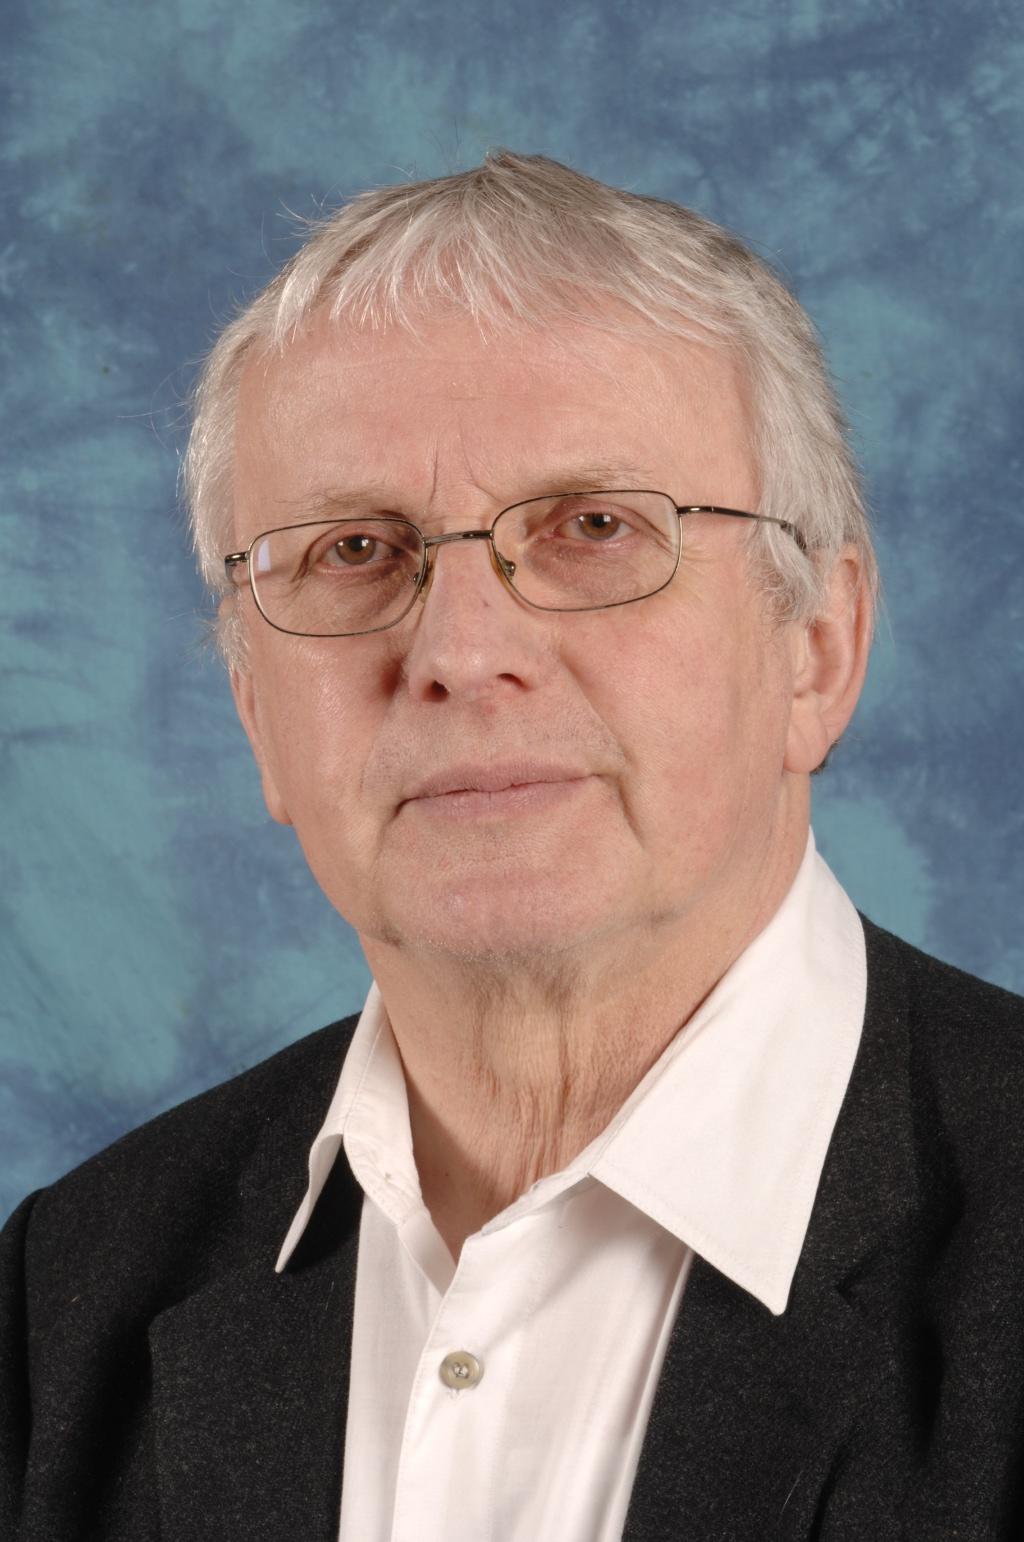 Helmut Koenig, Foto: Königskonzept